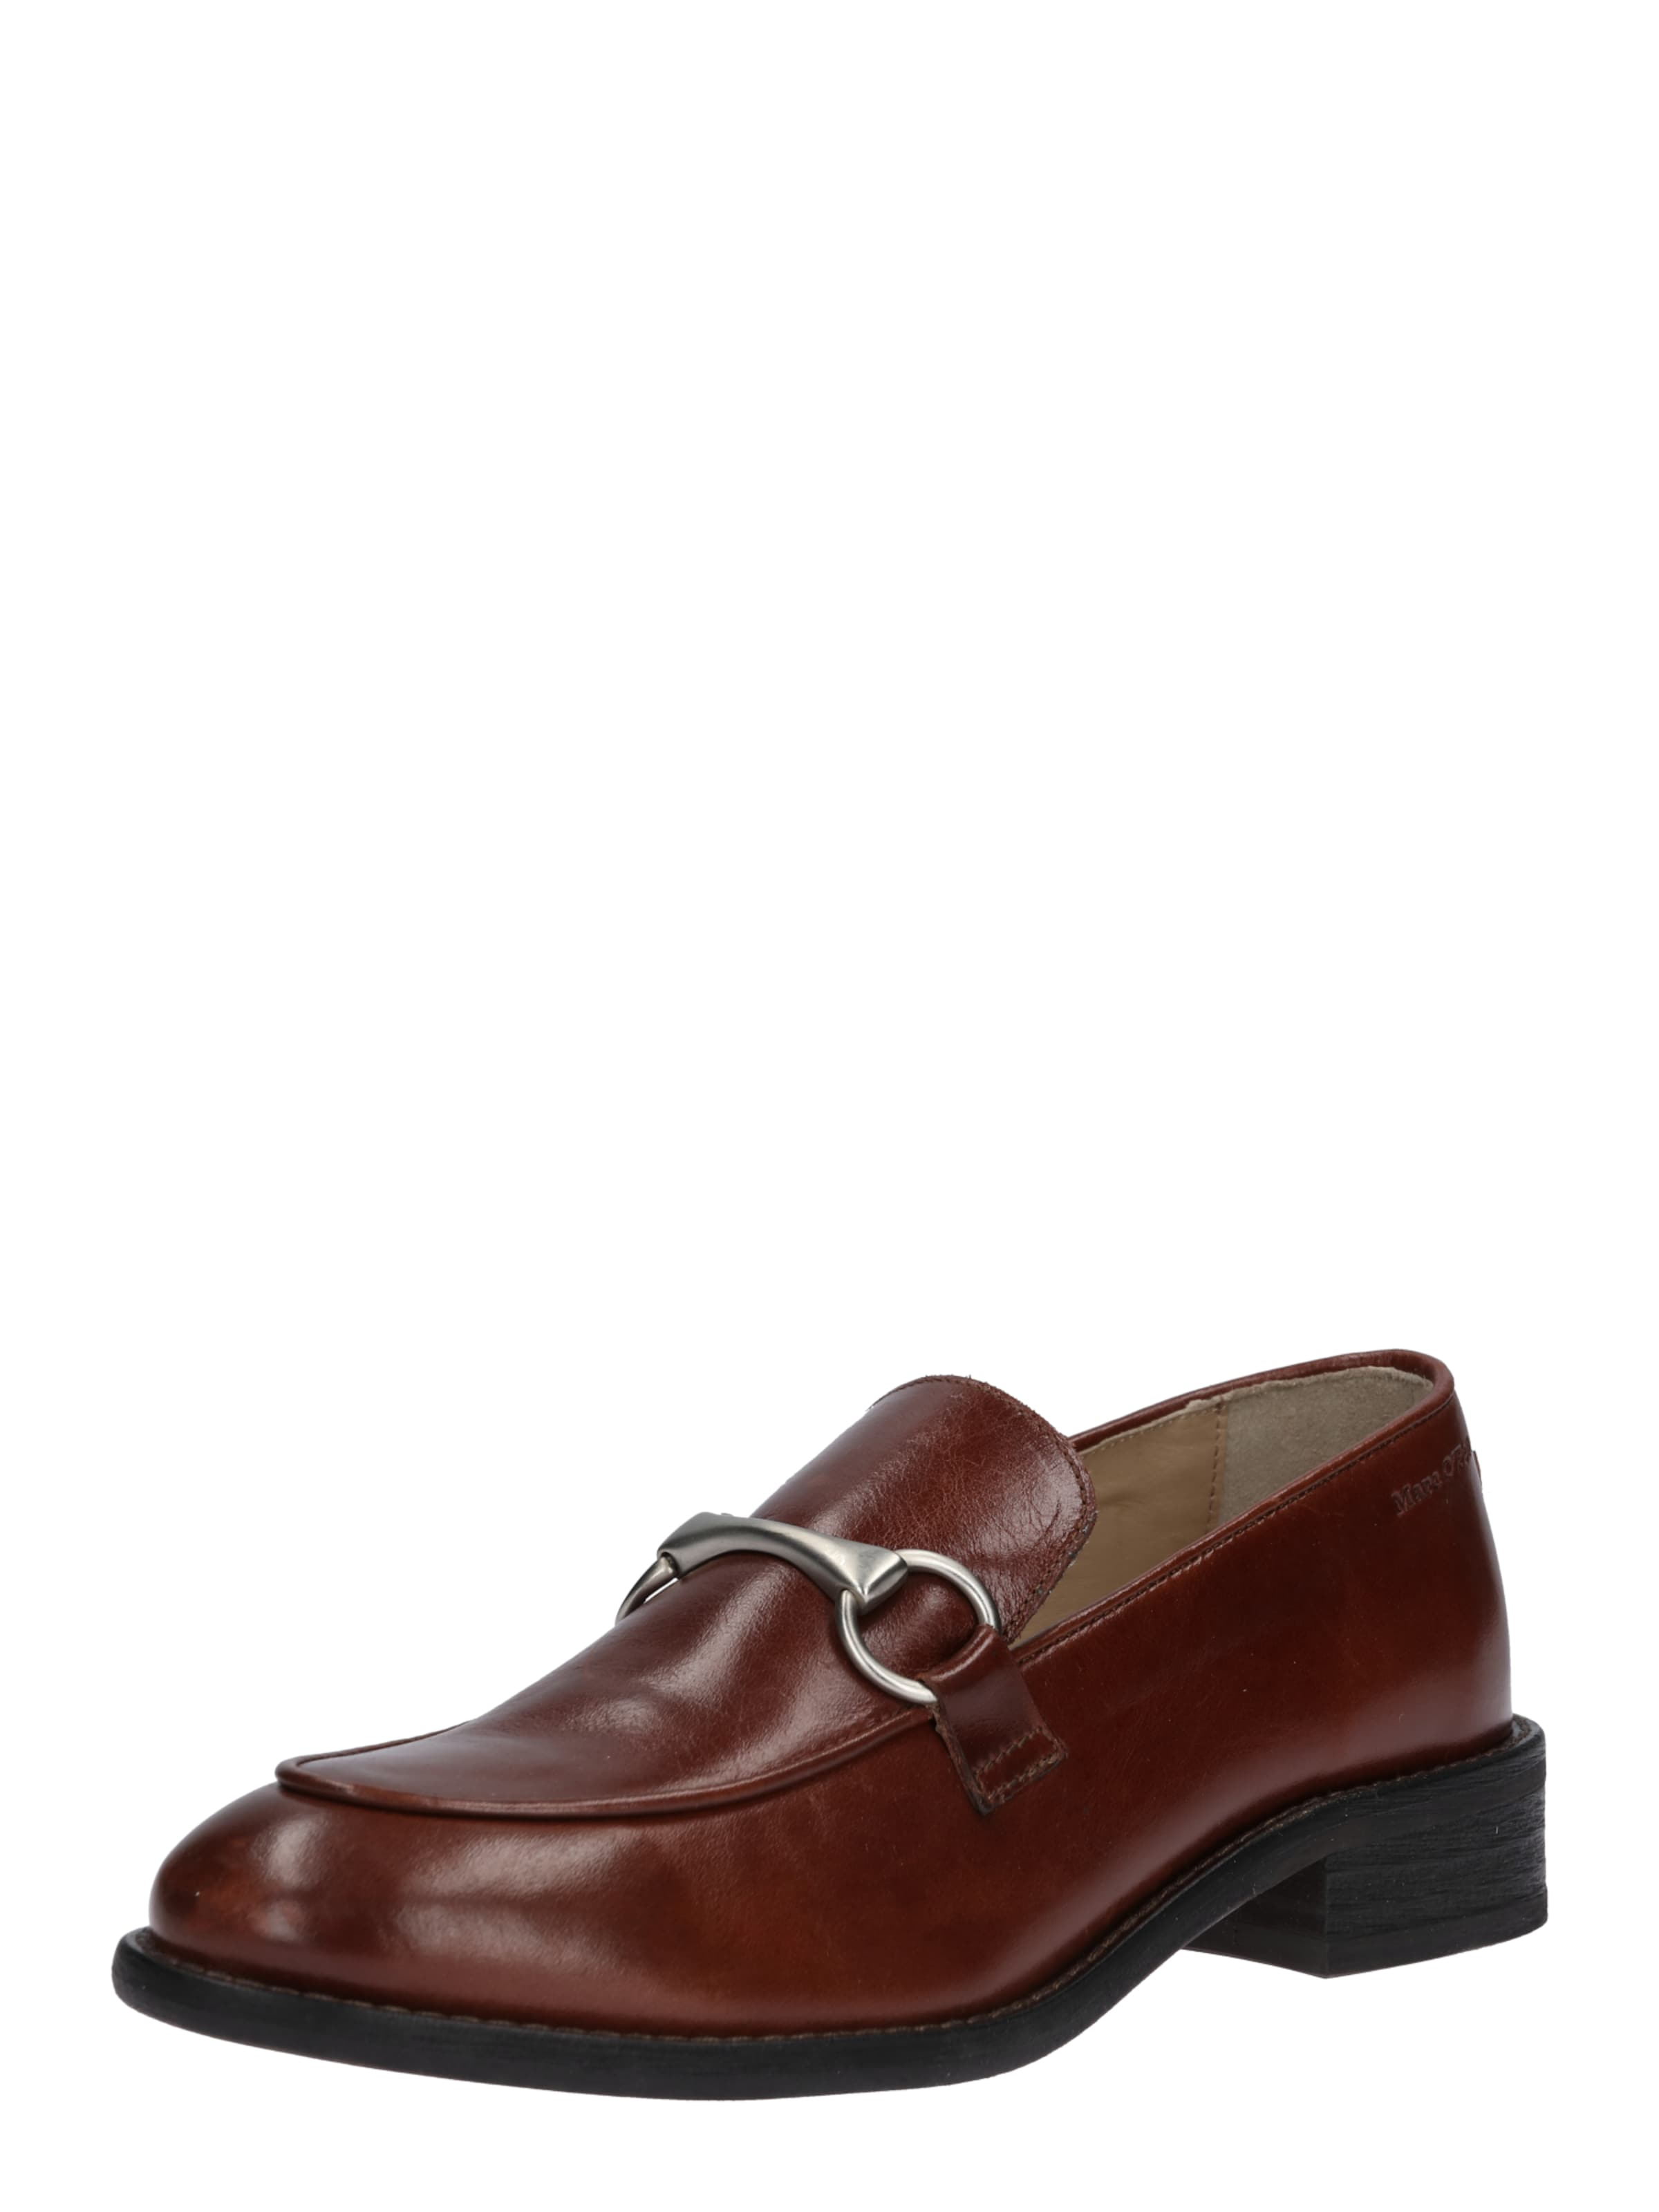 Marc O Polo Slipper Verschleißfeste billige Schuhe